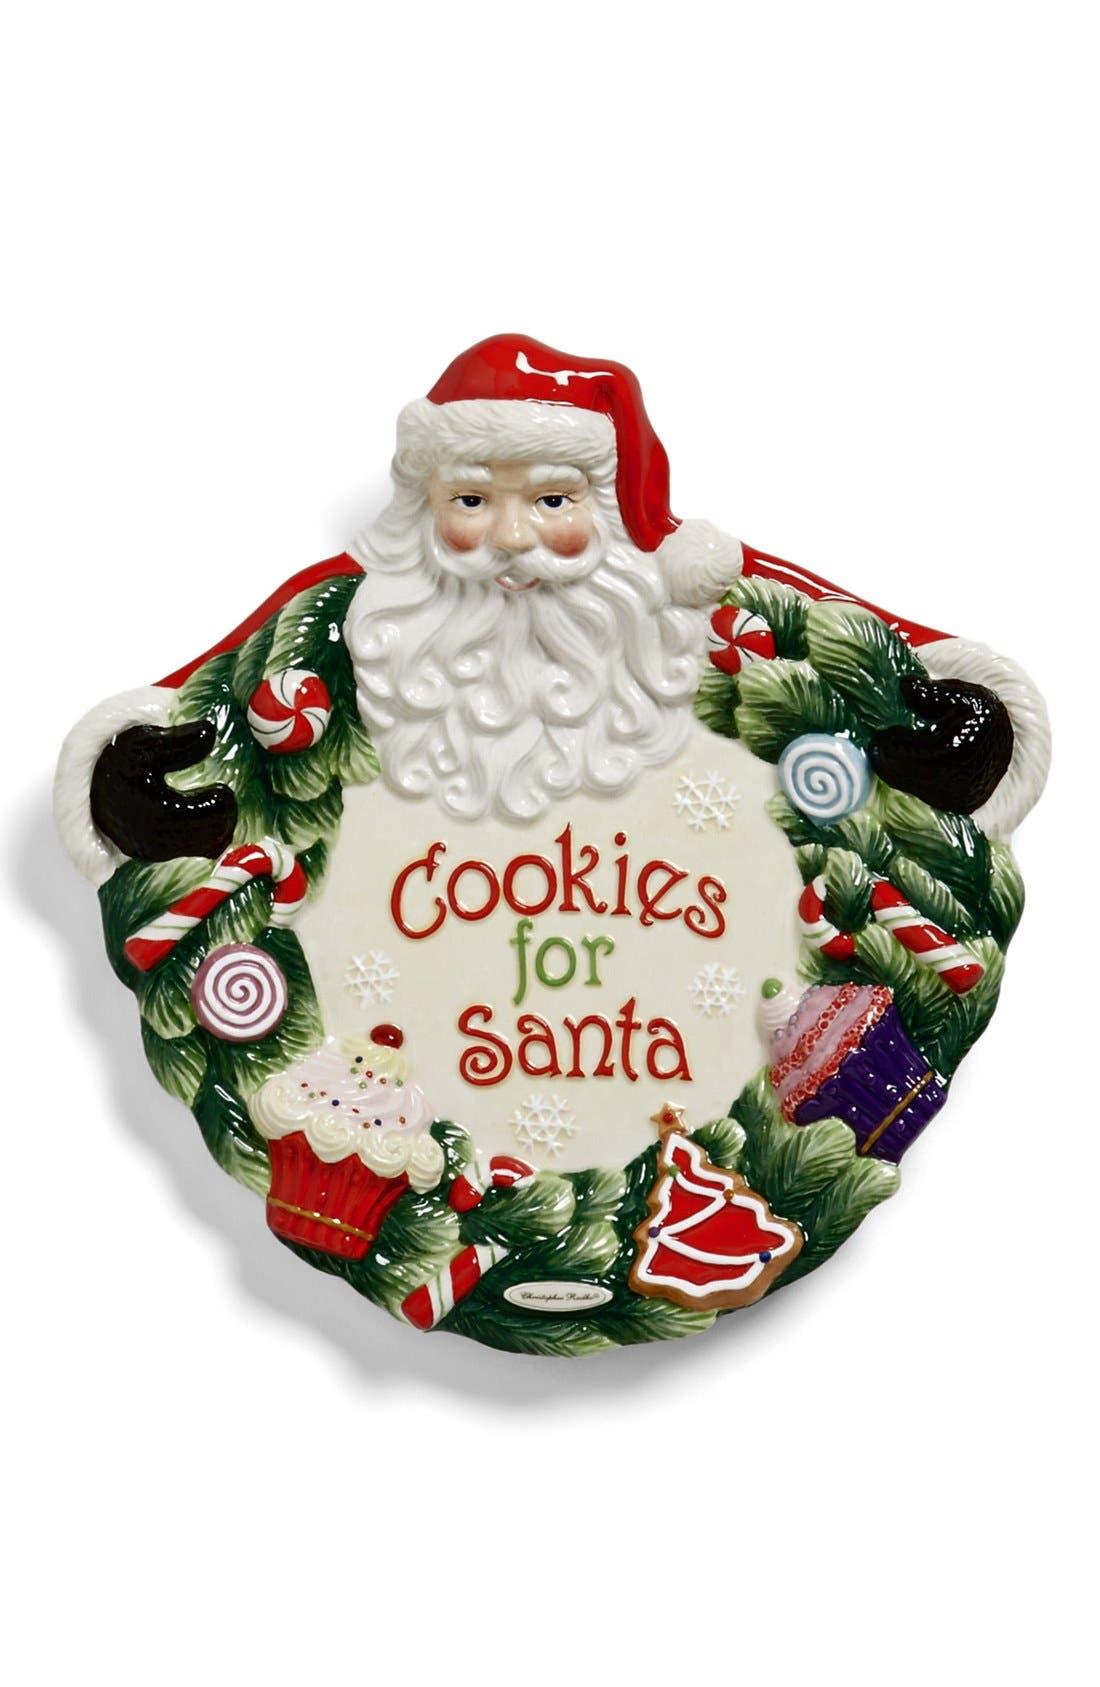 Alternate Image 1 Selected - Christopher Radko 'Cookies for Santa' Ceramic Plate